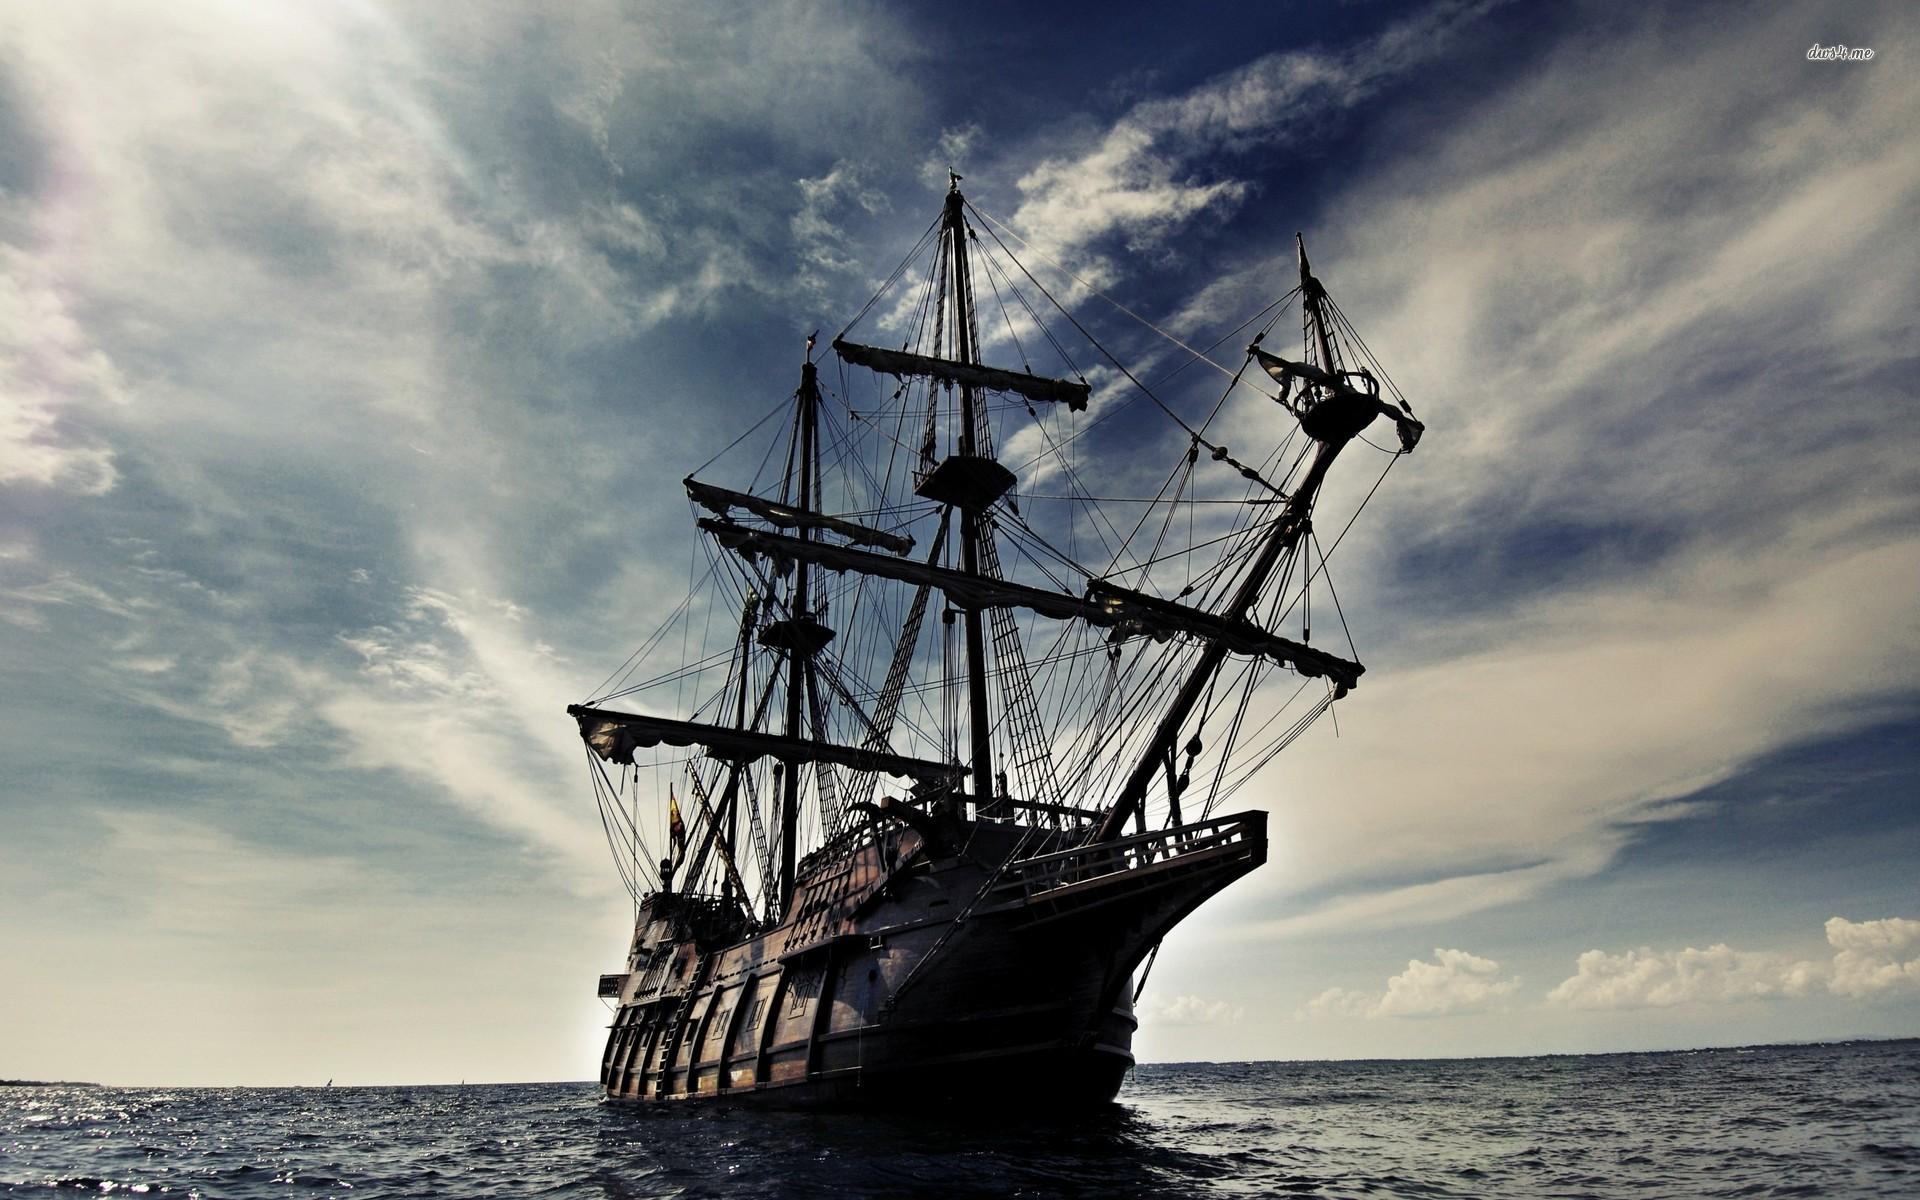 Hd Pirate Ship Wallpaper: The Black Pearl Wallpaper